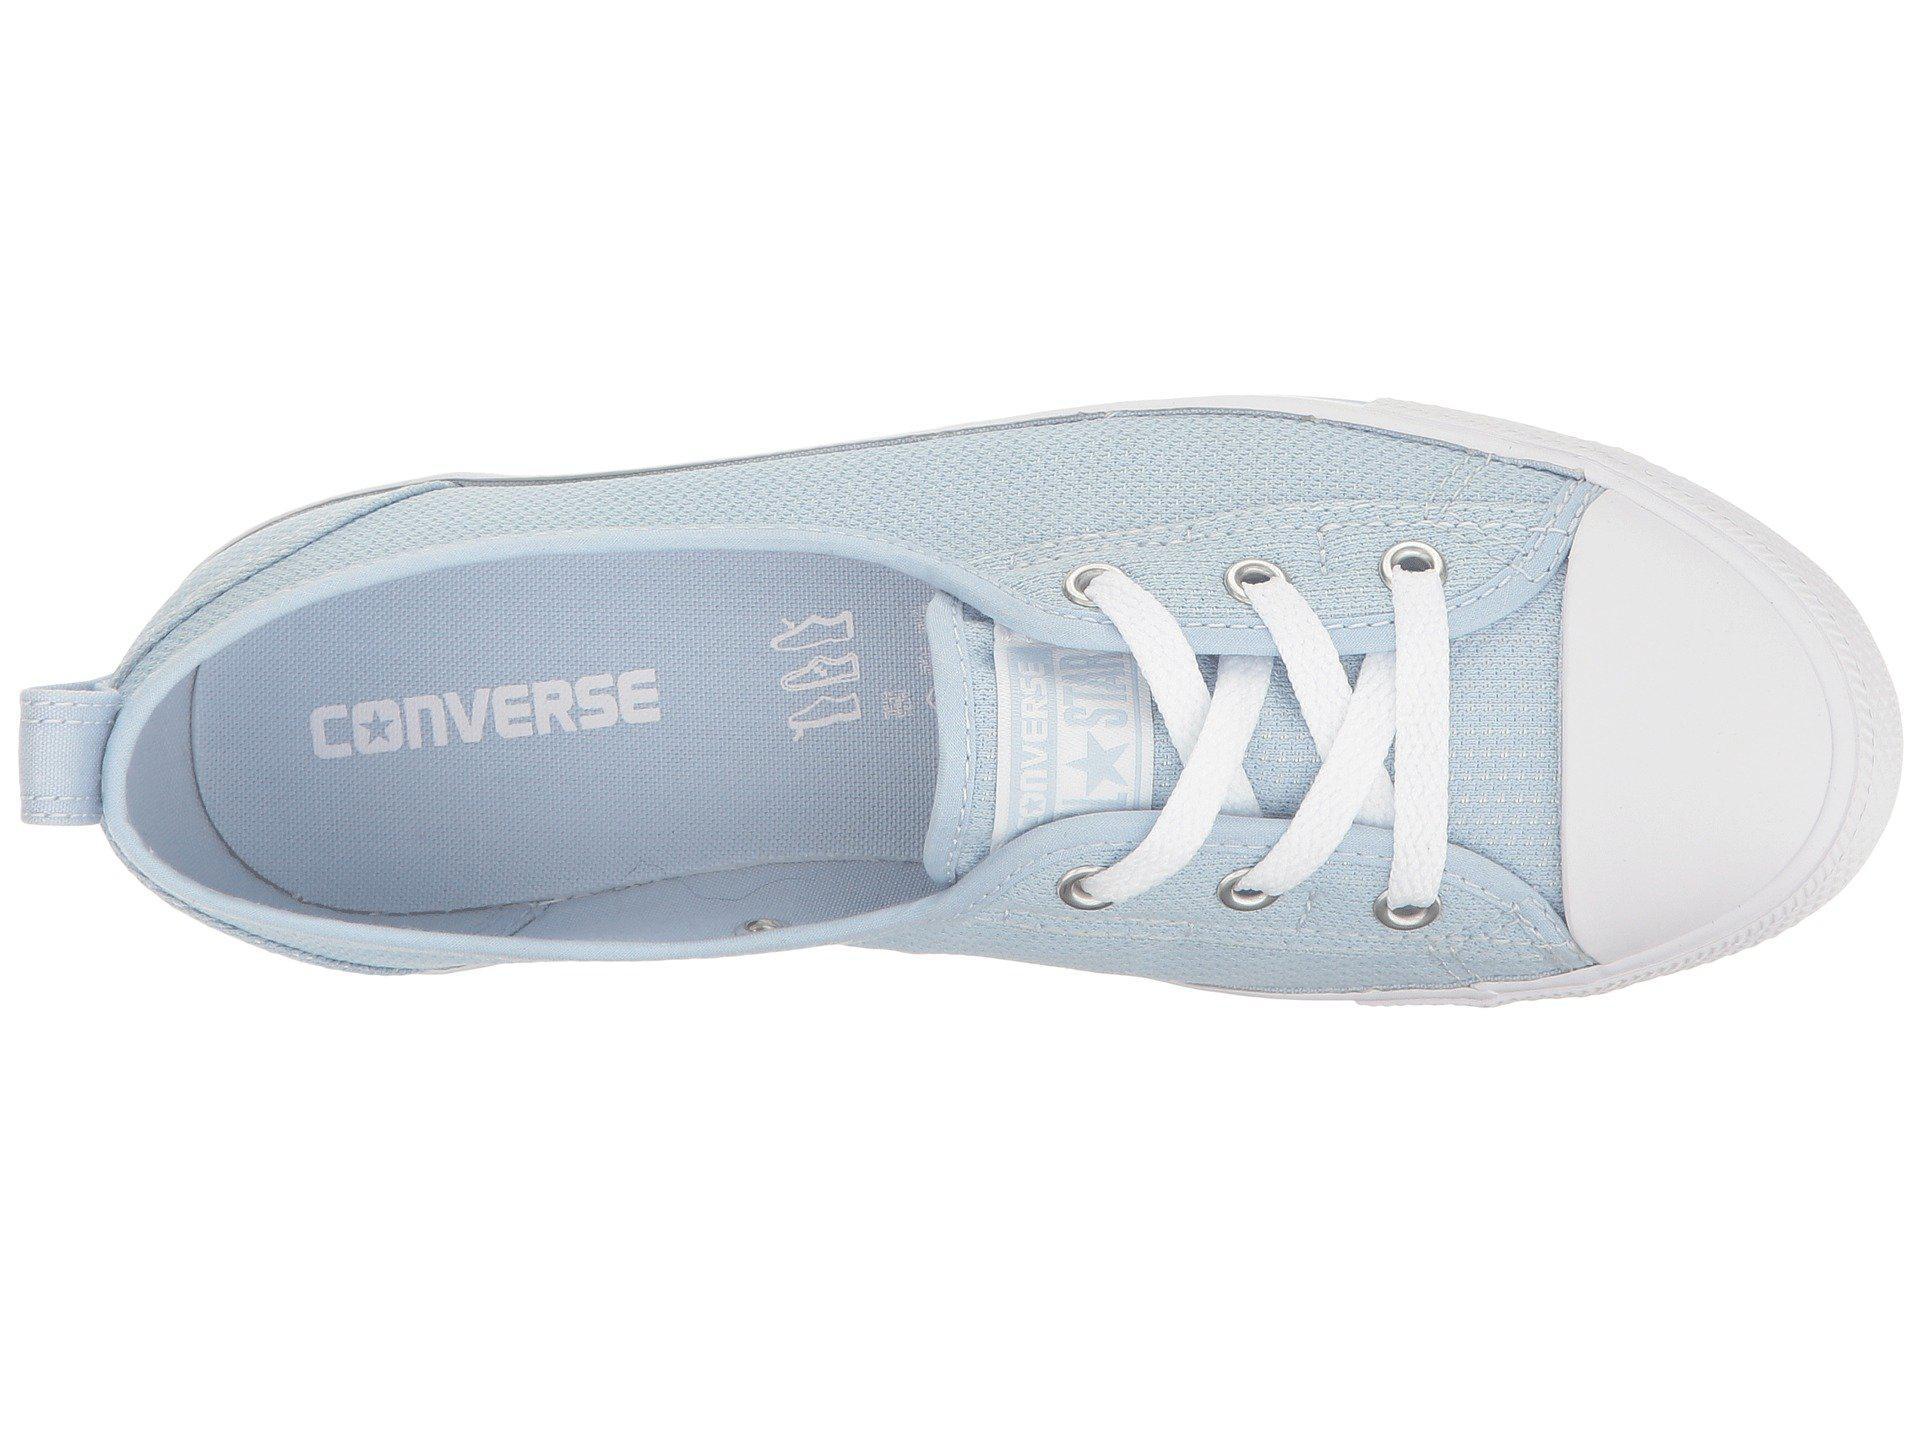 Lyst - Converse Chuck Taylor® All Star® Ballet Lace Micro Dot Slip ... 8d75c5346